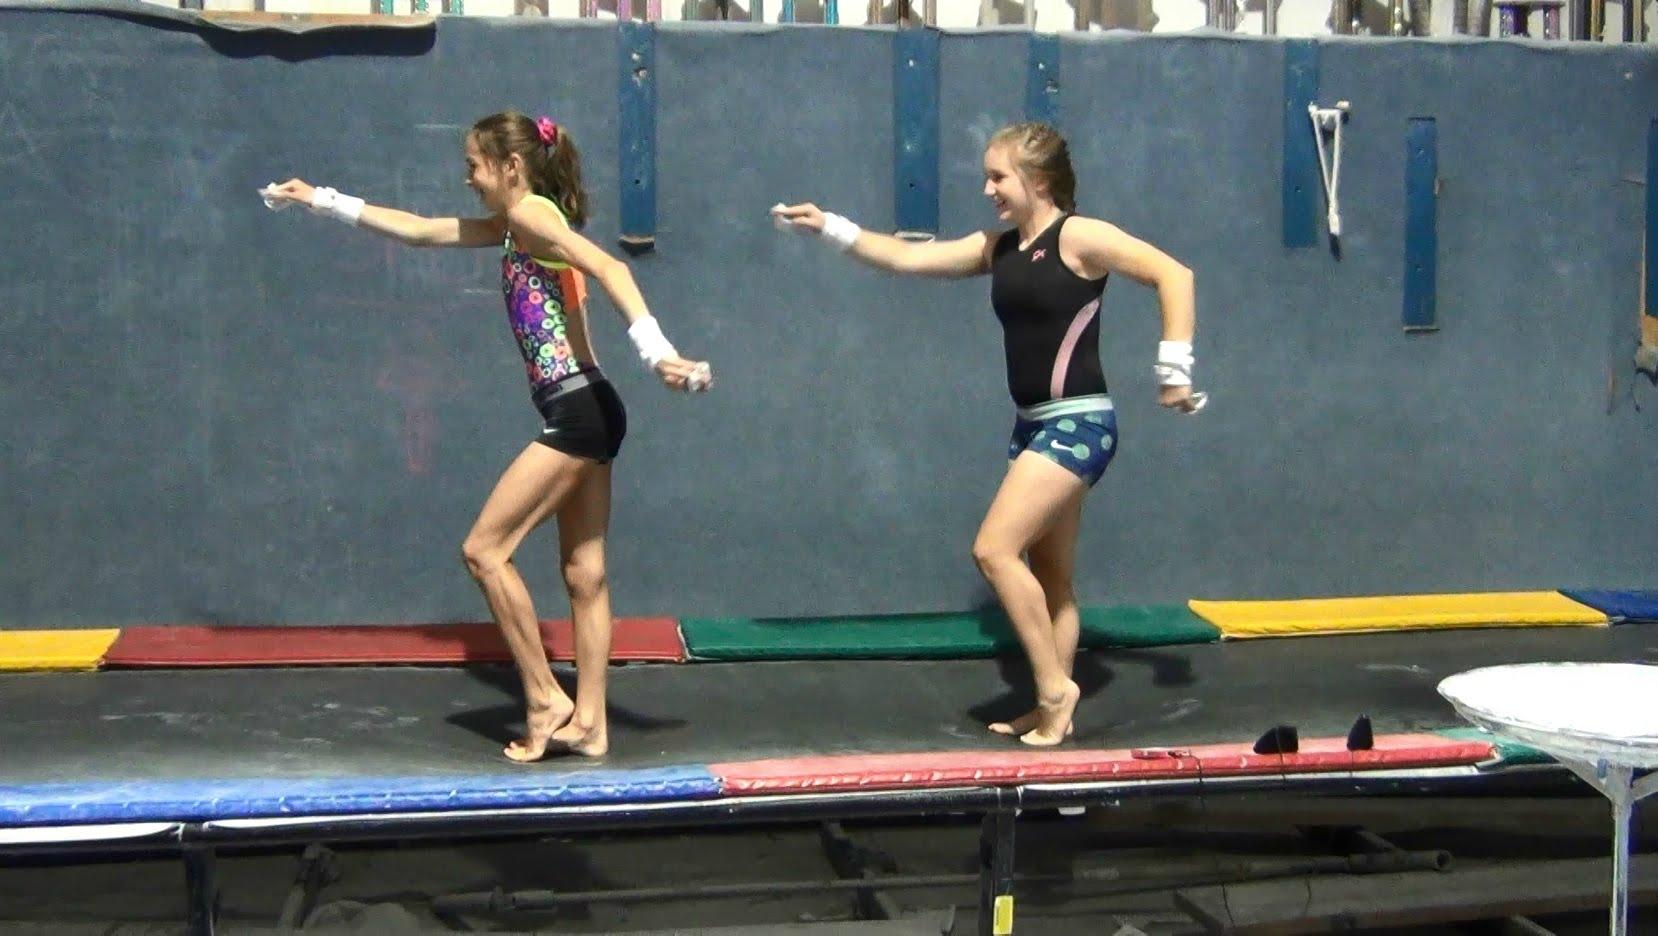 St. Louis Spirits Gymnastics Club image 0